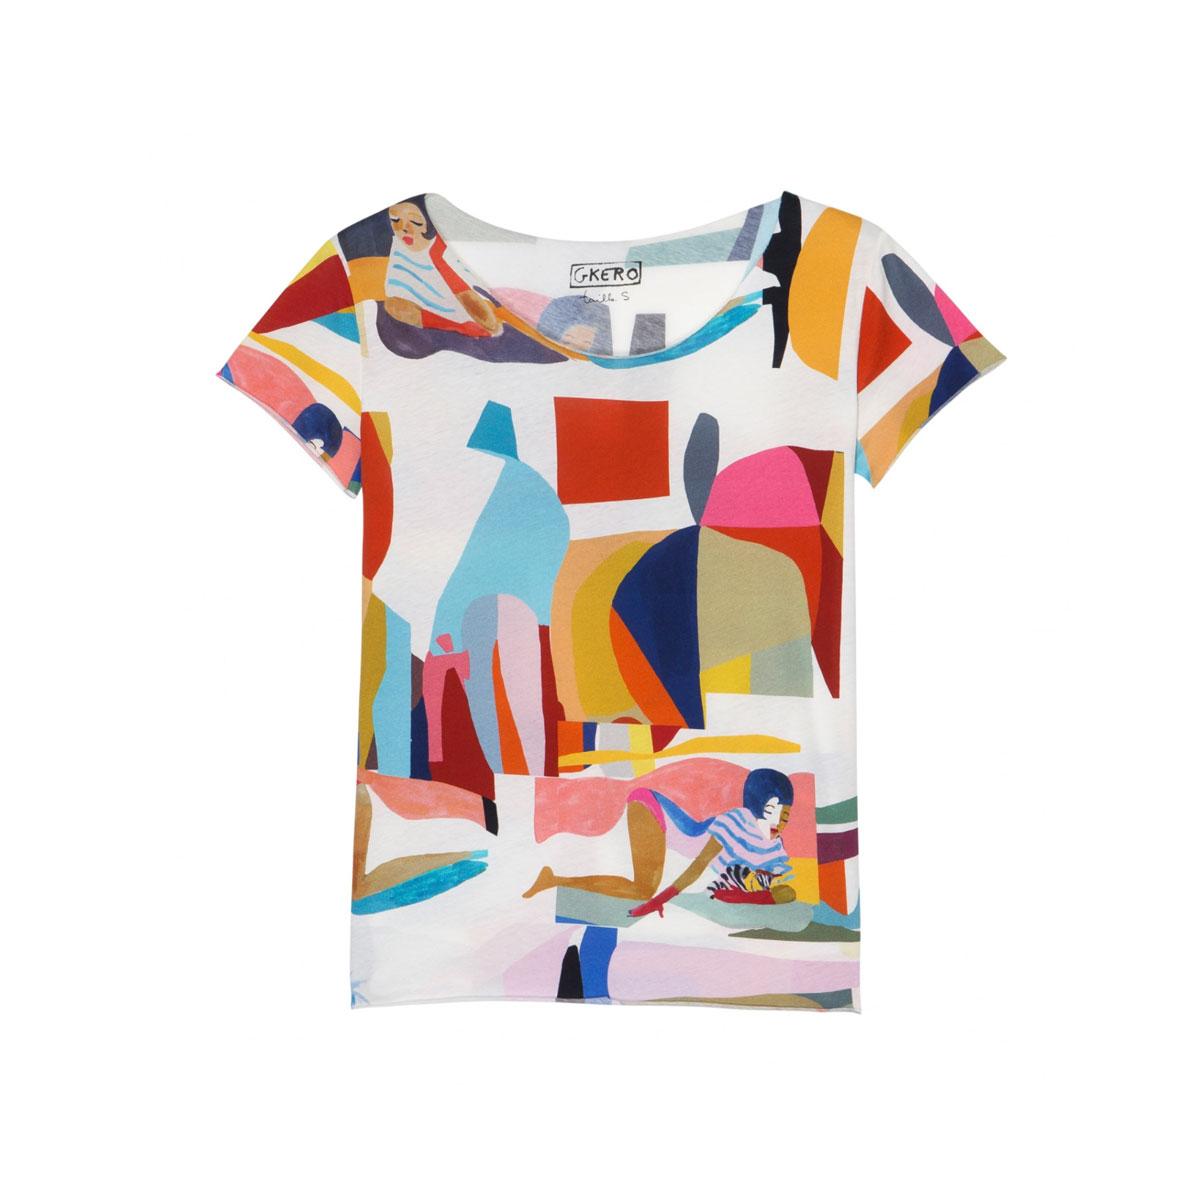 G.KERO Tee shirt ABSTRACT FUNK